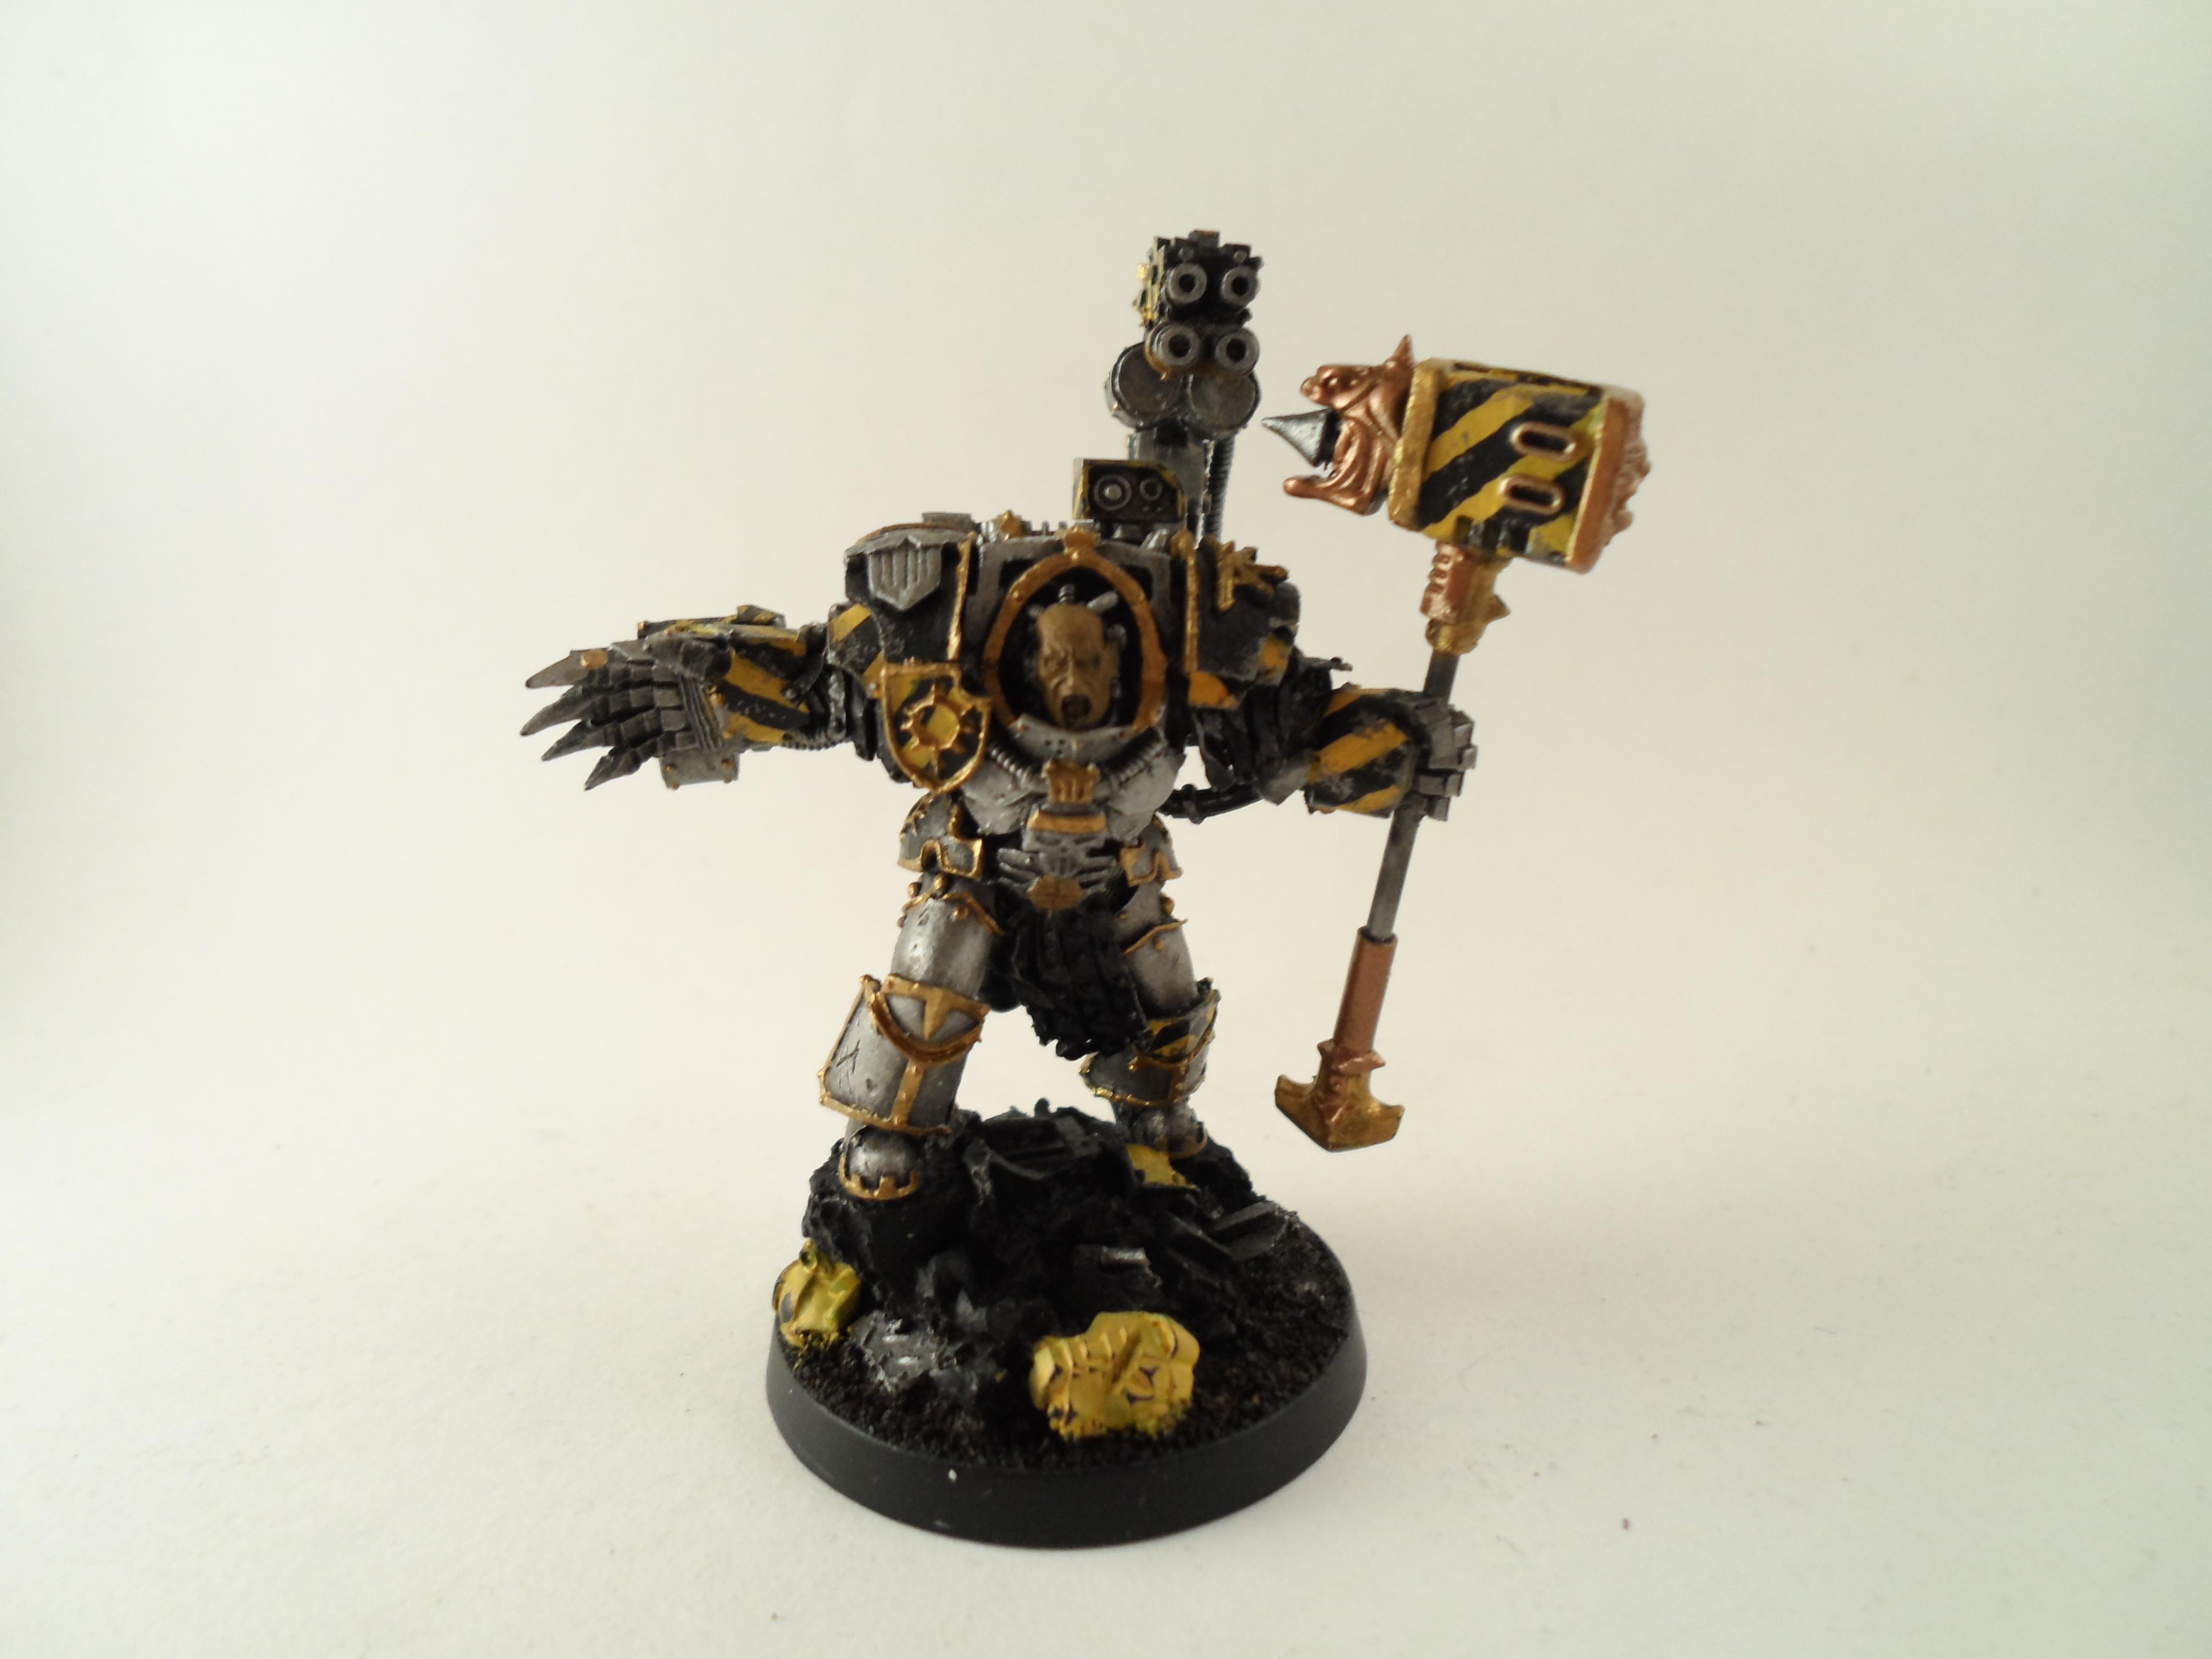 Chaos Spae Marine, Iron Warriors, Warhammer 40,000, Warsmith